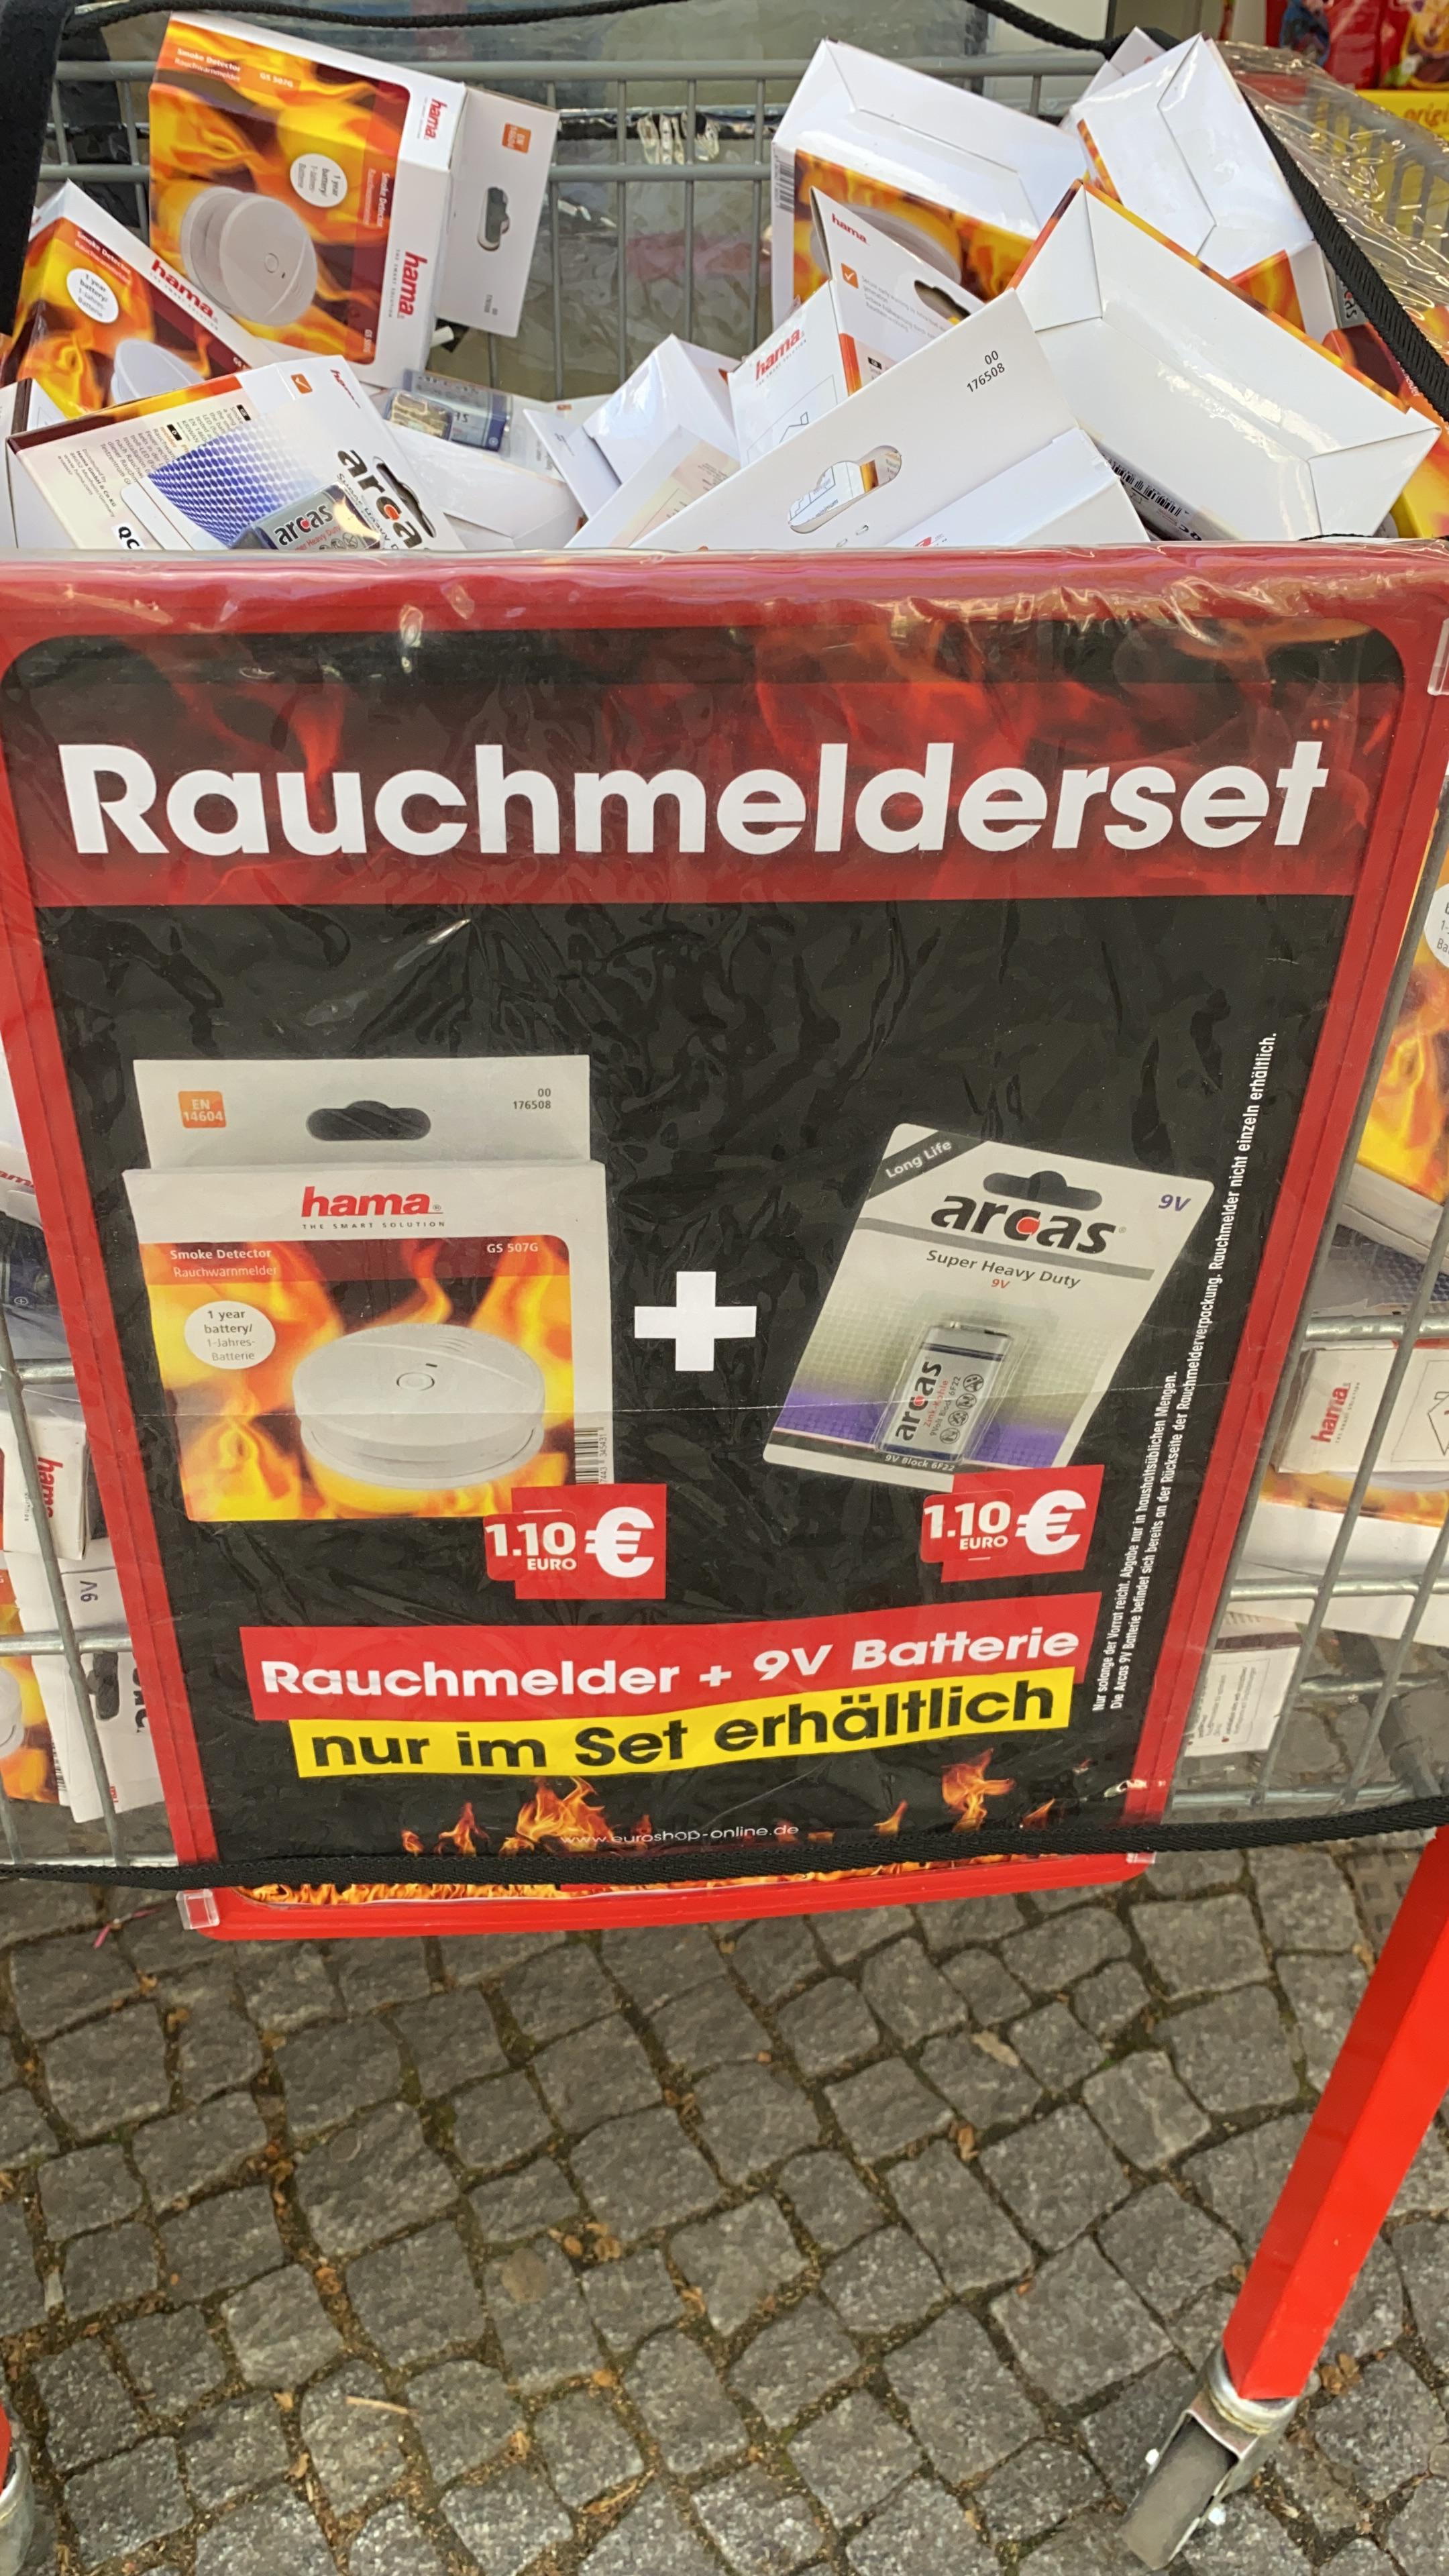 [Lokal Berlin Steglitz] EuroShop HAMA GS507G Photoelektrischer Rauchwarnmelder inkl. 9V Block